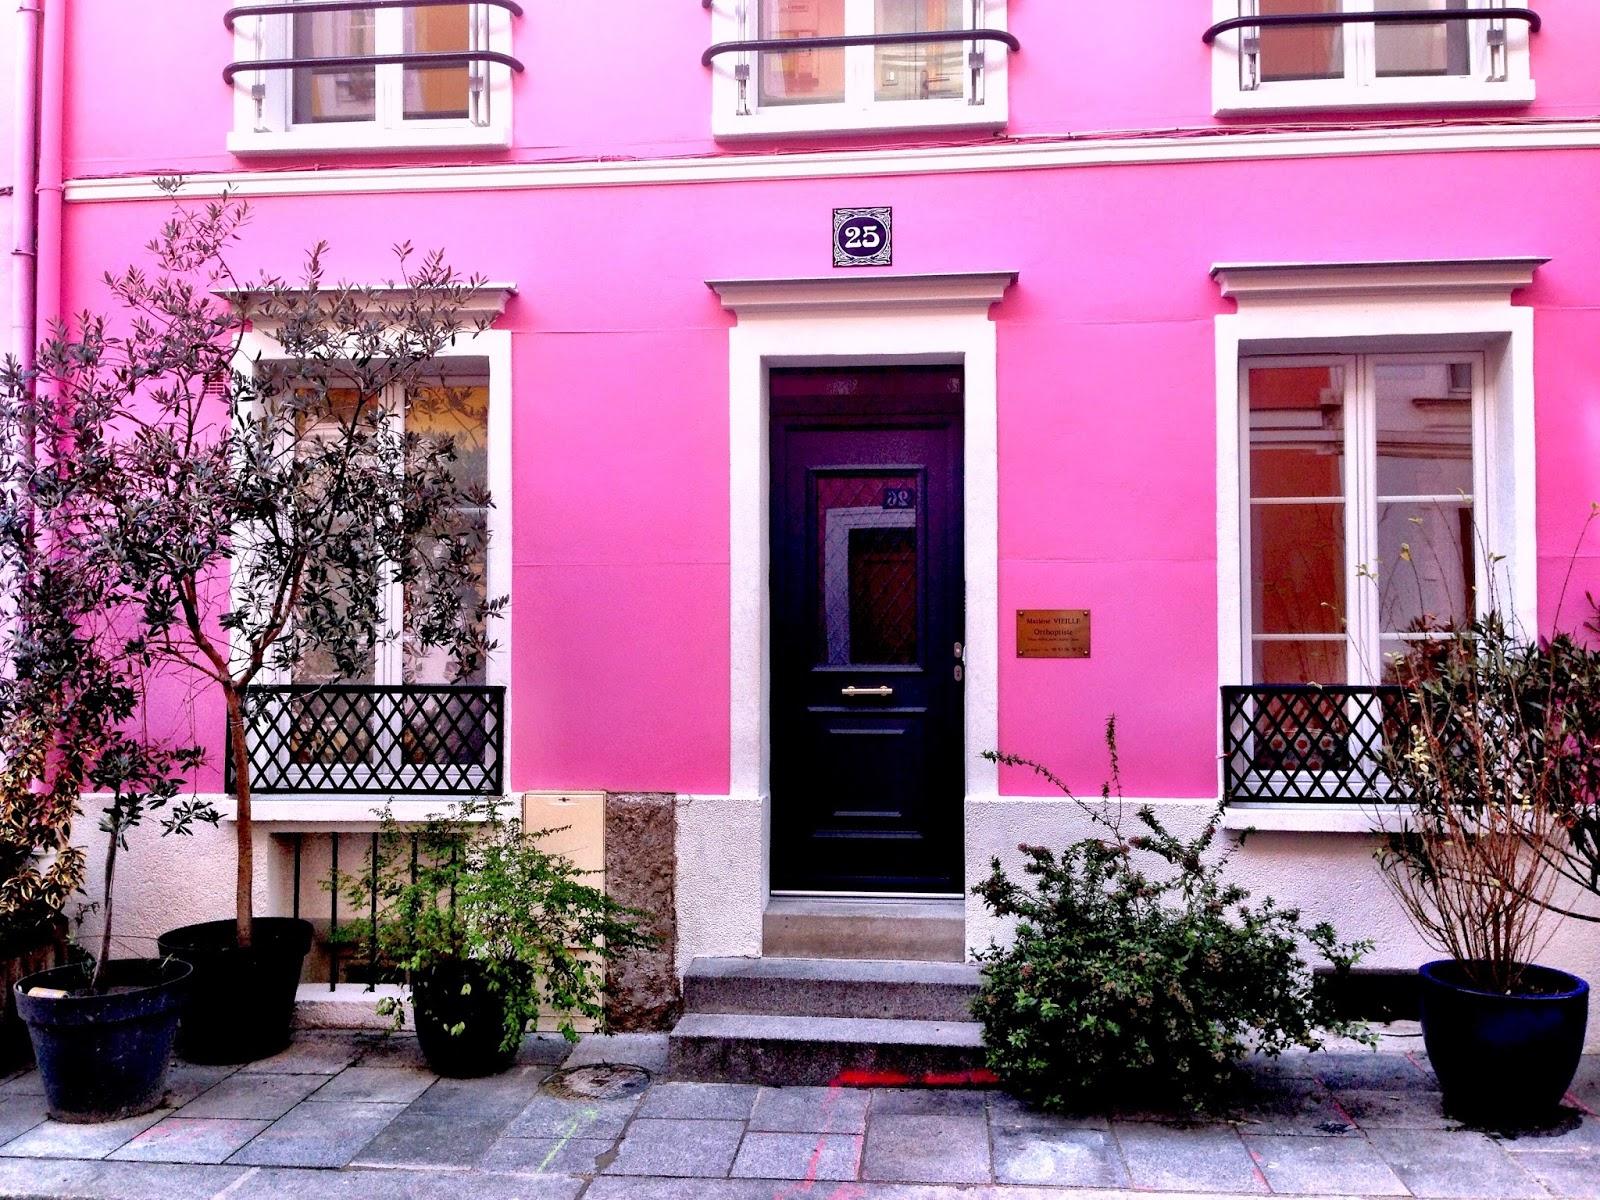 Focus On Paris: Street of color